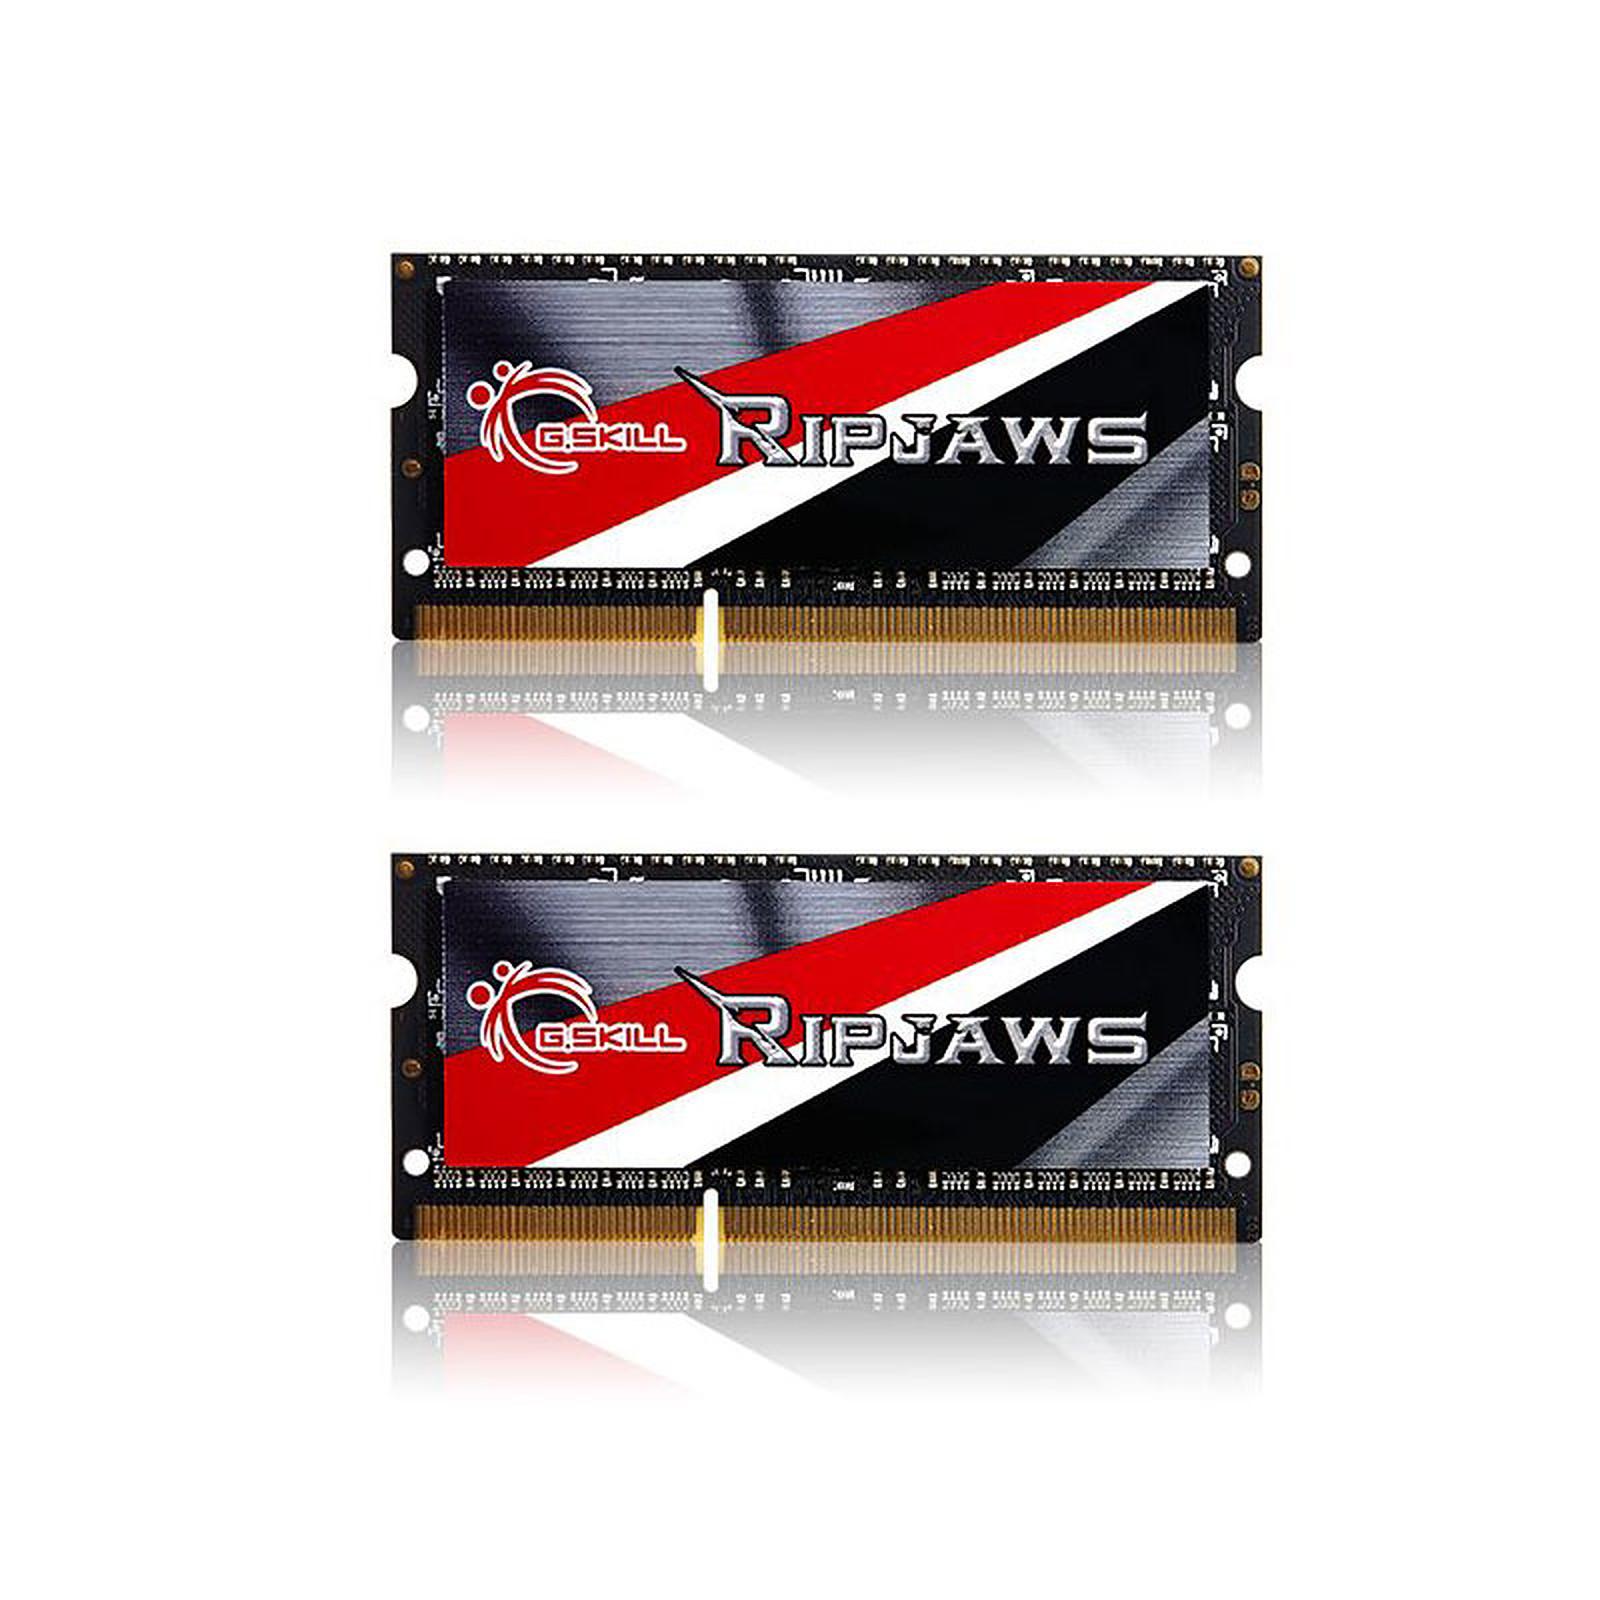 G.Skill RipJaws Series SO-DIMM 16 Go (2 x 8 Go) DDR3 1600 MHz CL11